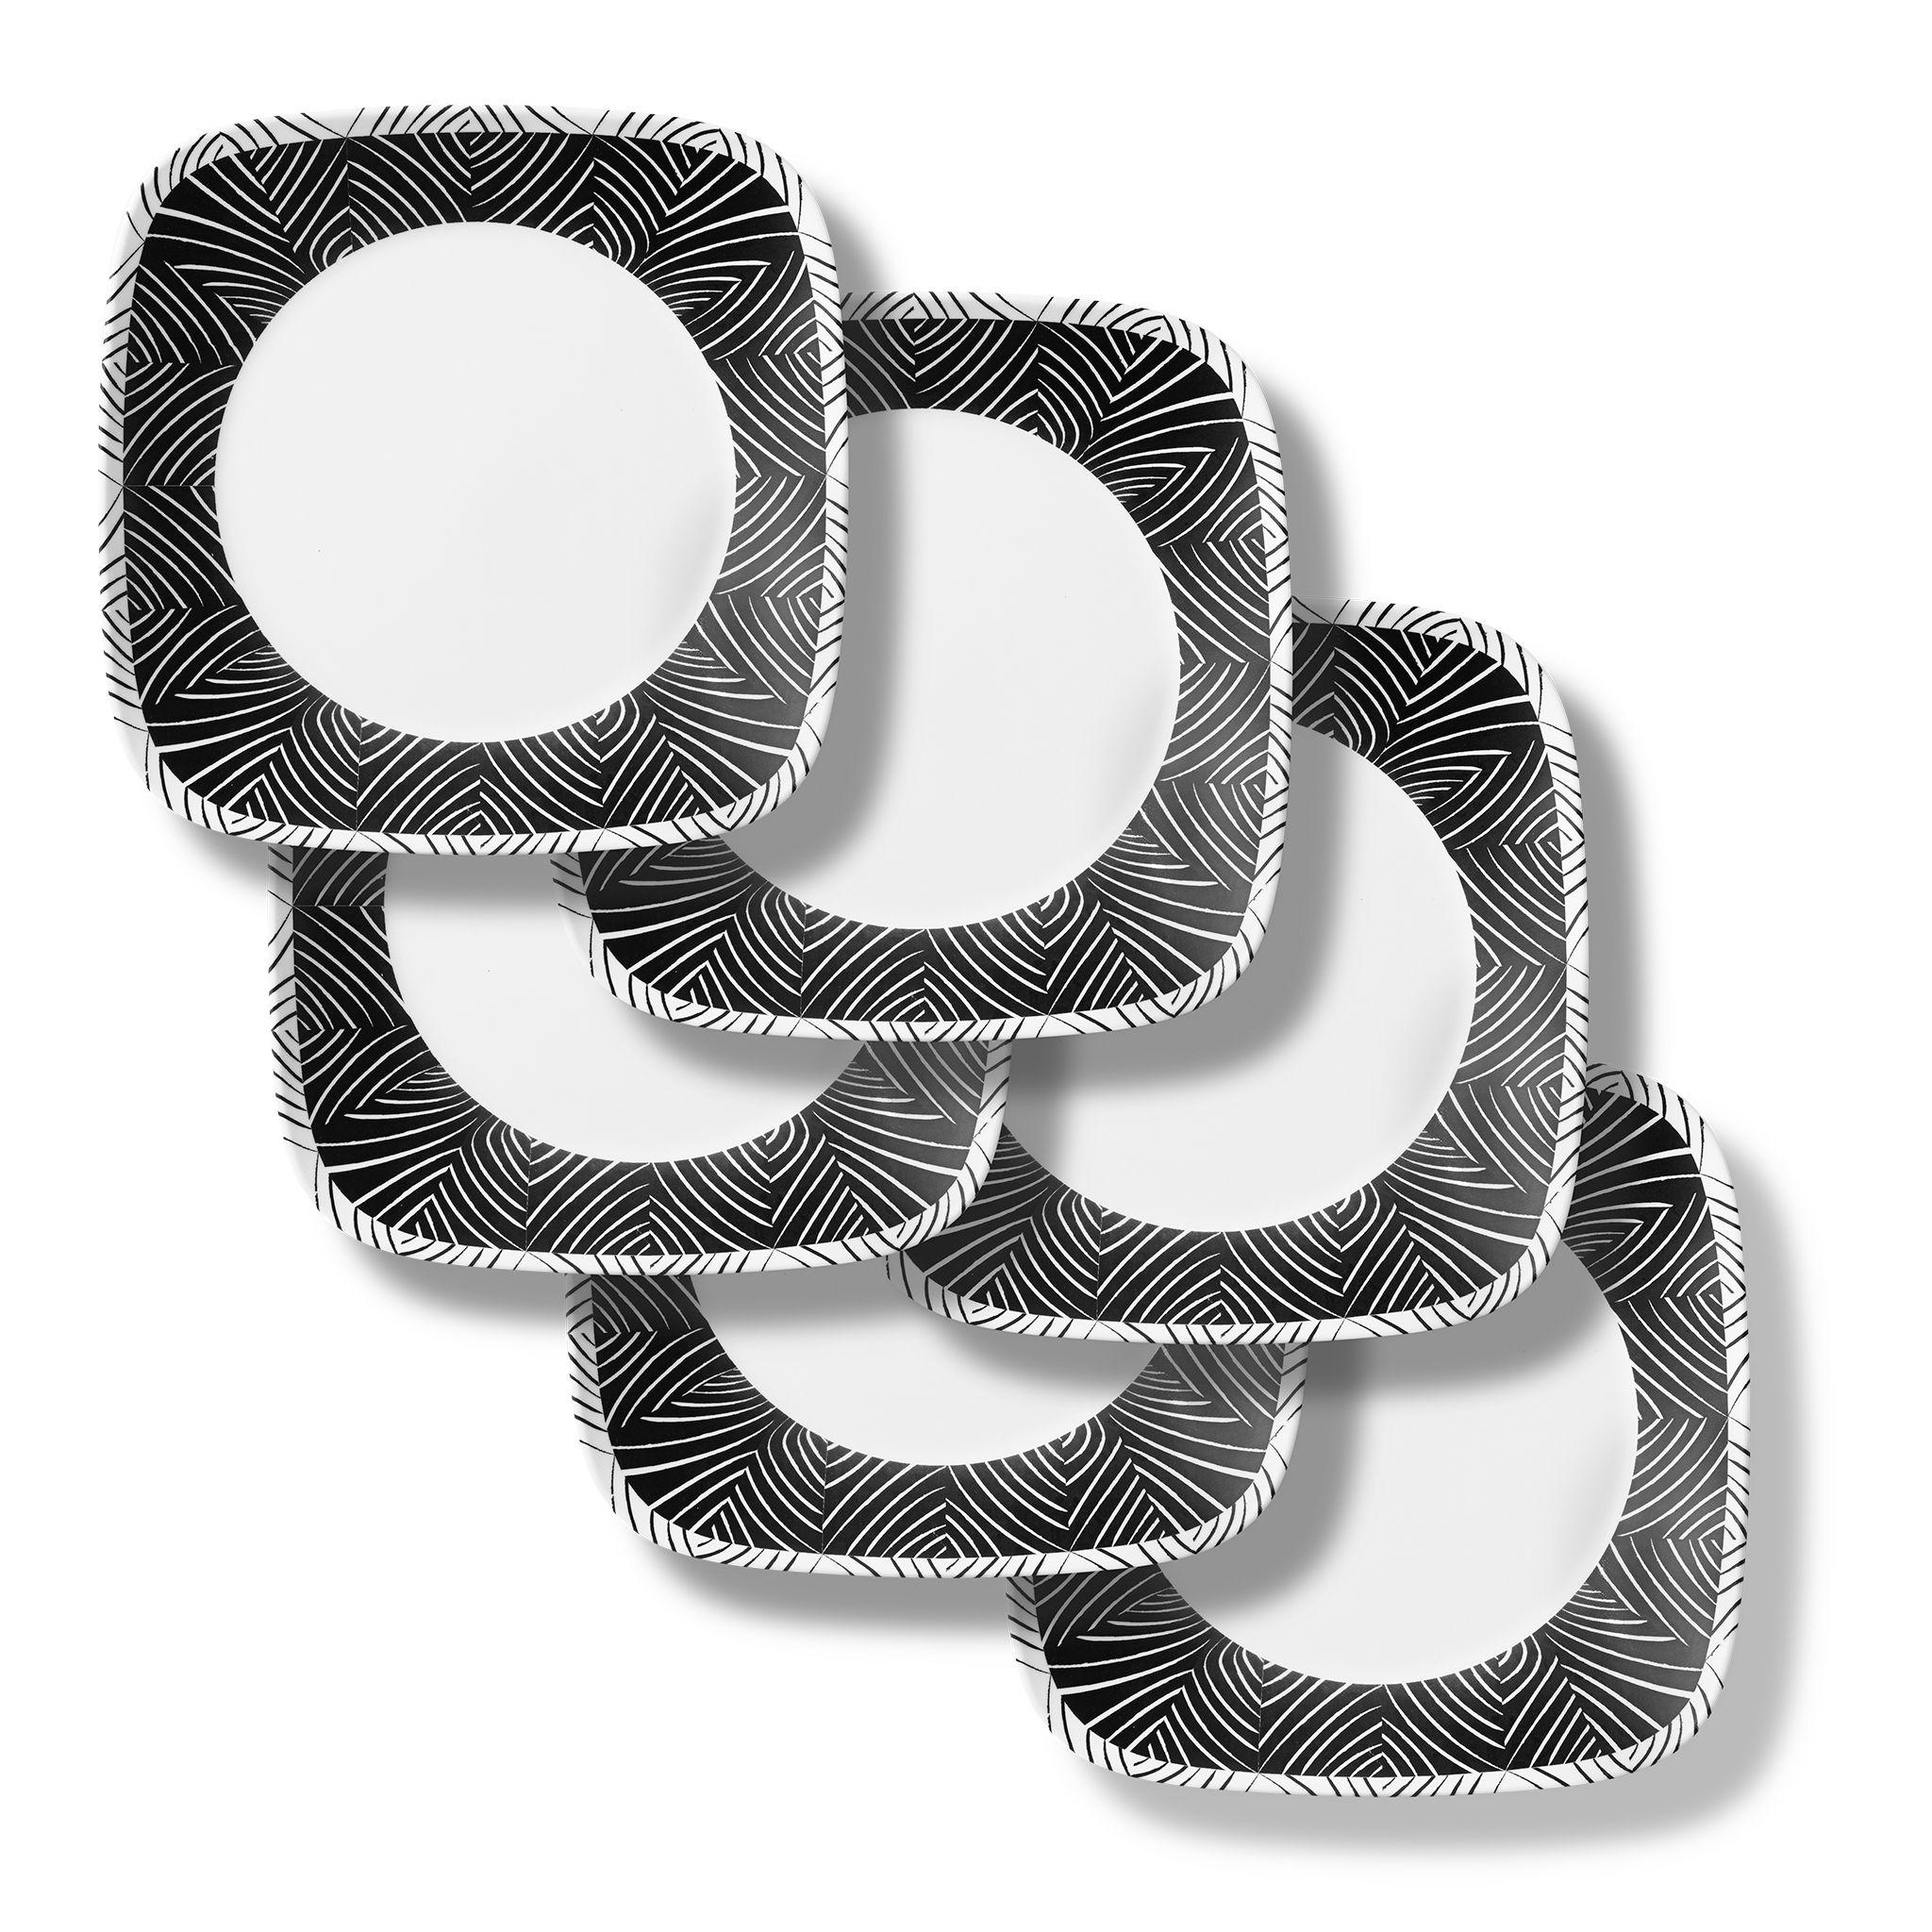 Imani Square 10.5? Dinner Plates, 6-pack